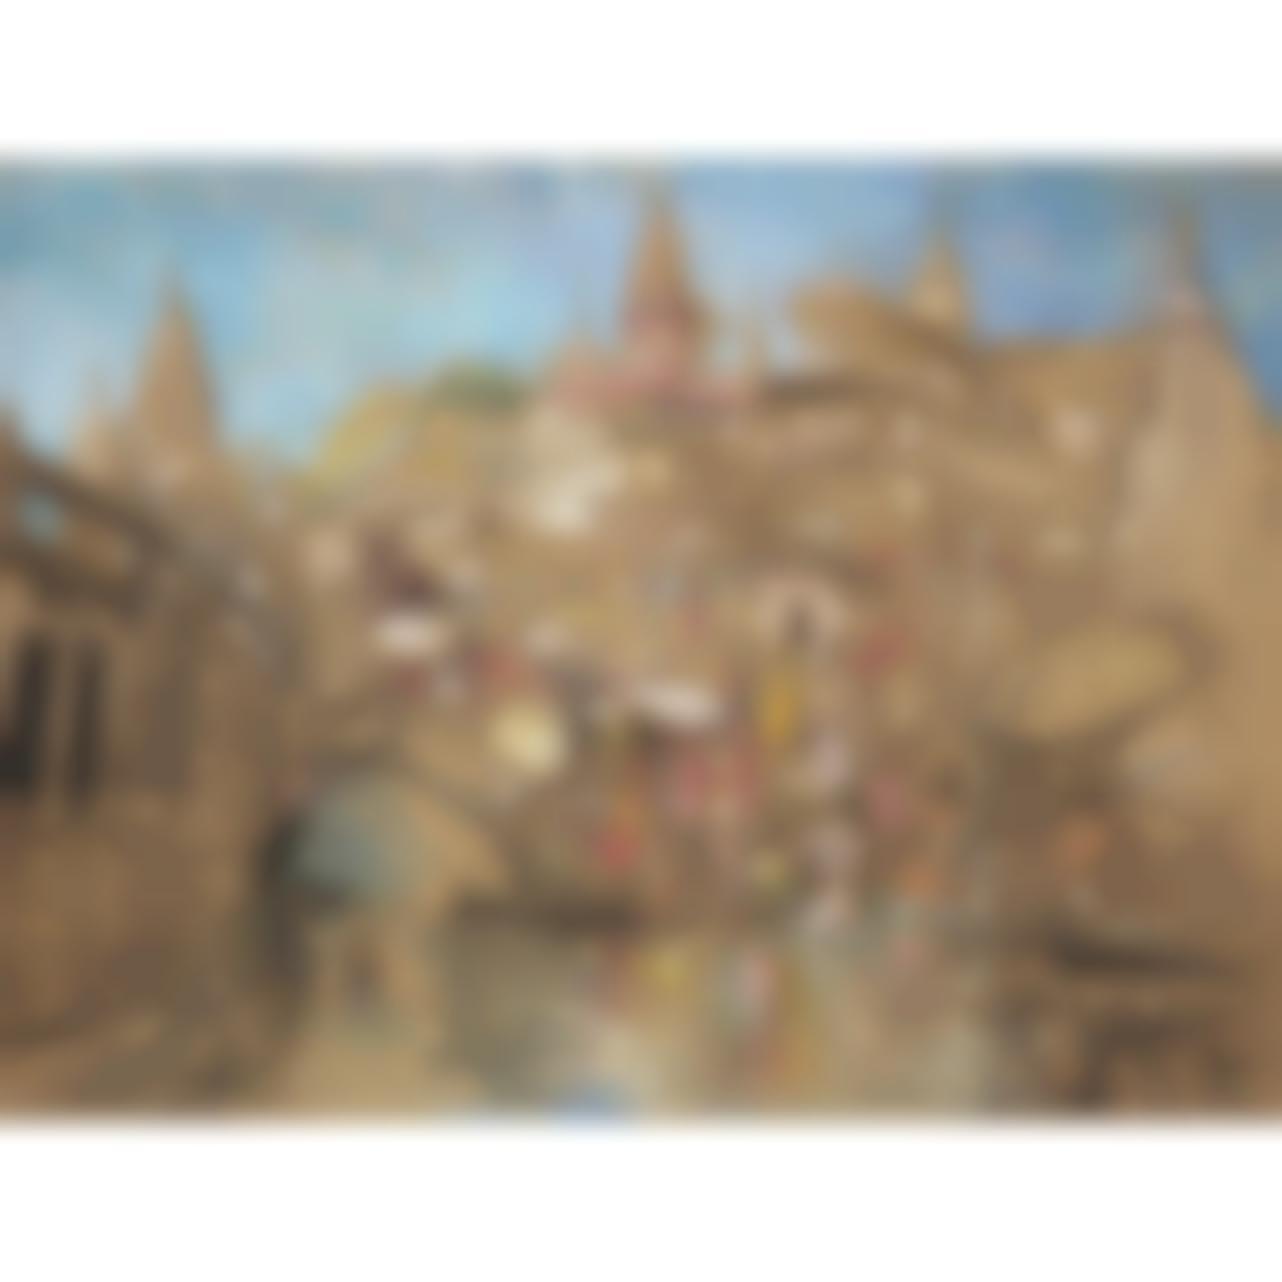 Adrien Jean Le Mayeur De Merpres-Baignade A Bali-